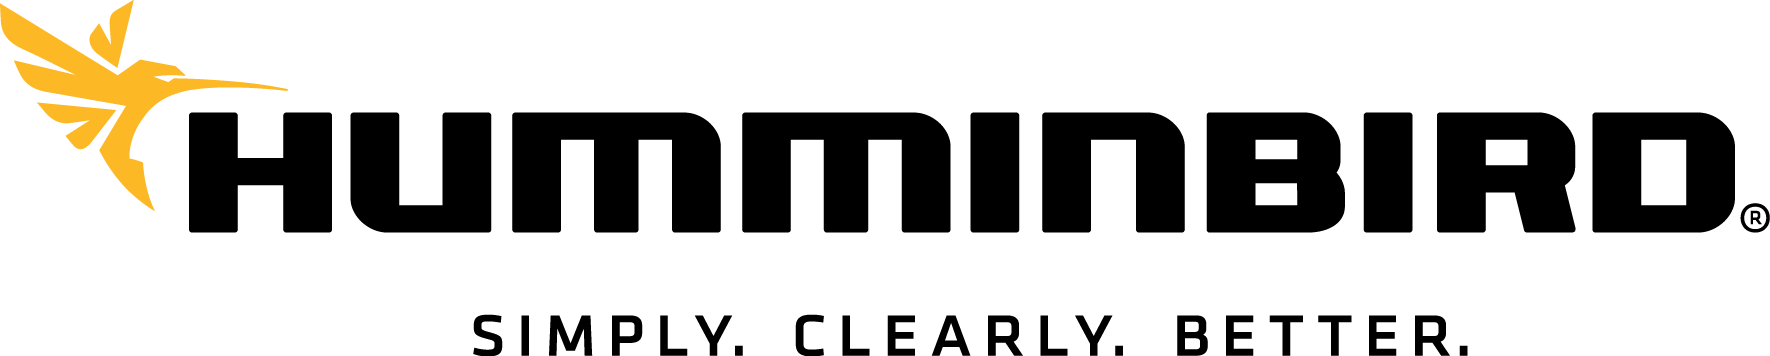 HB_CMYK_logo_tag